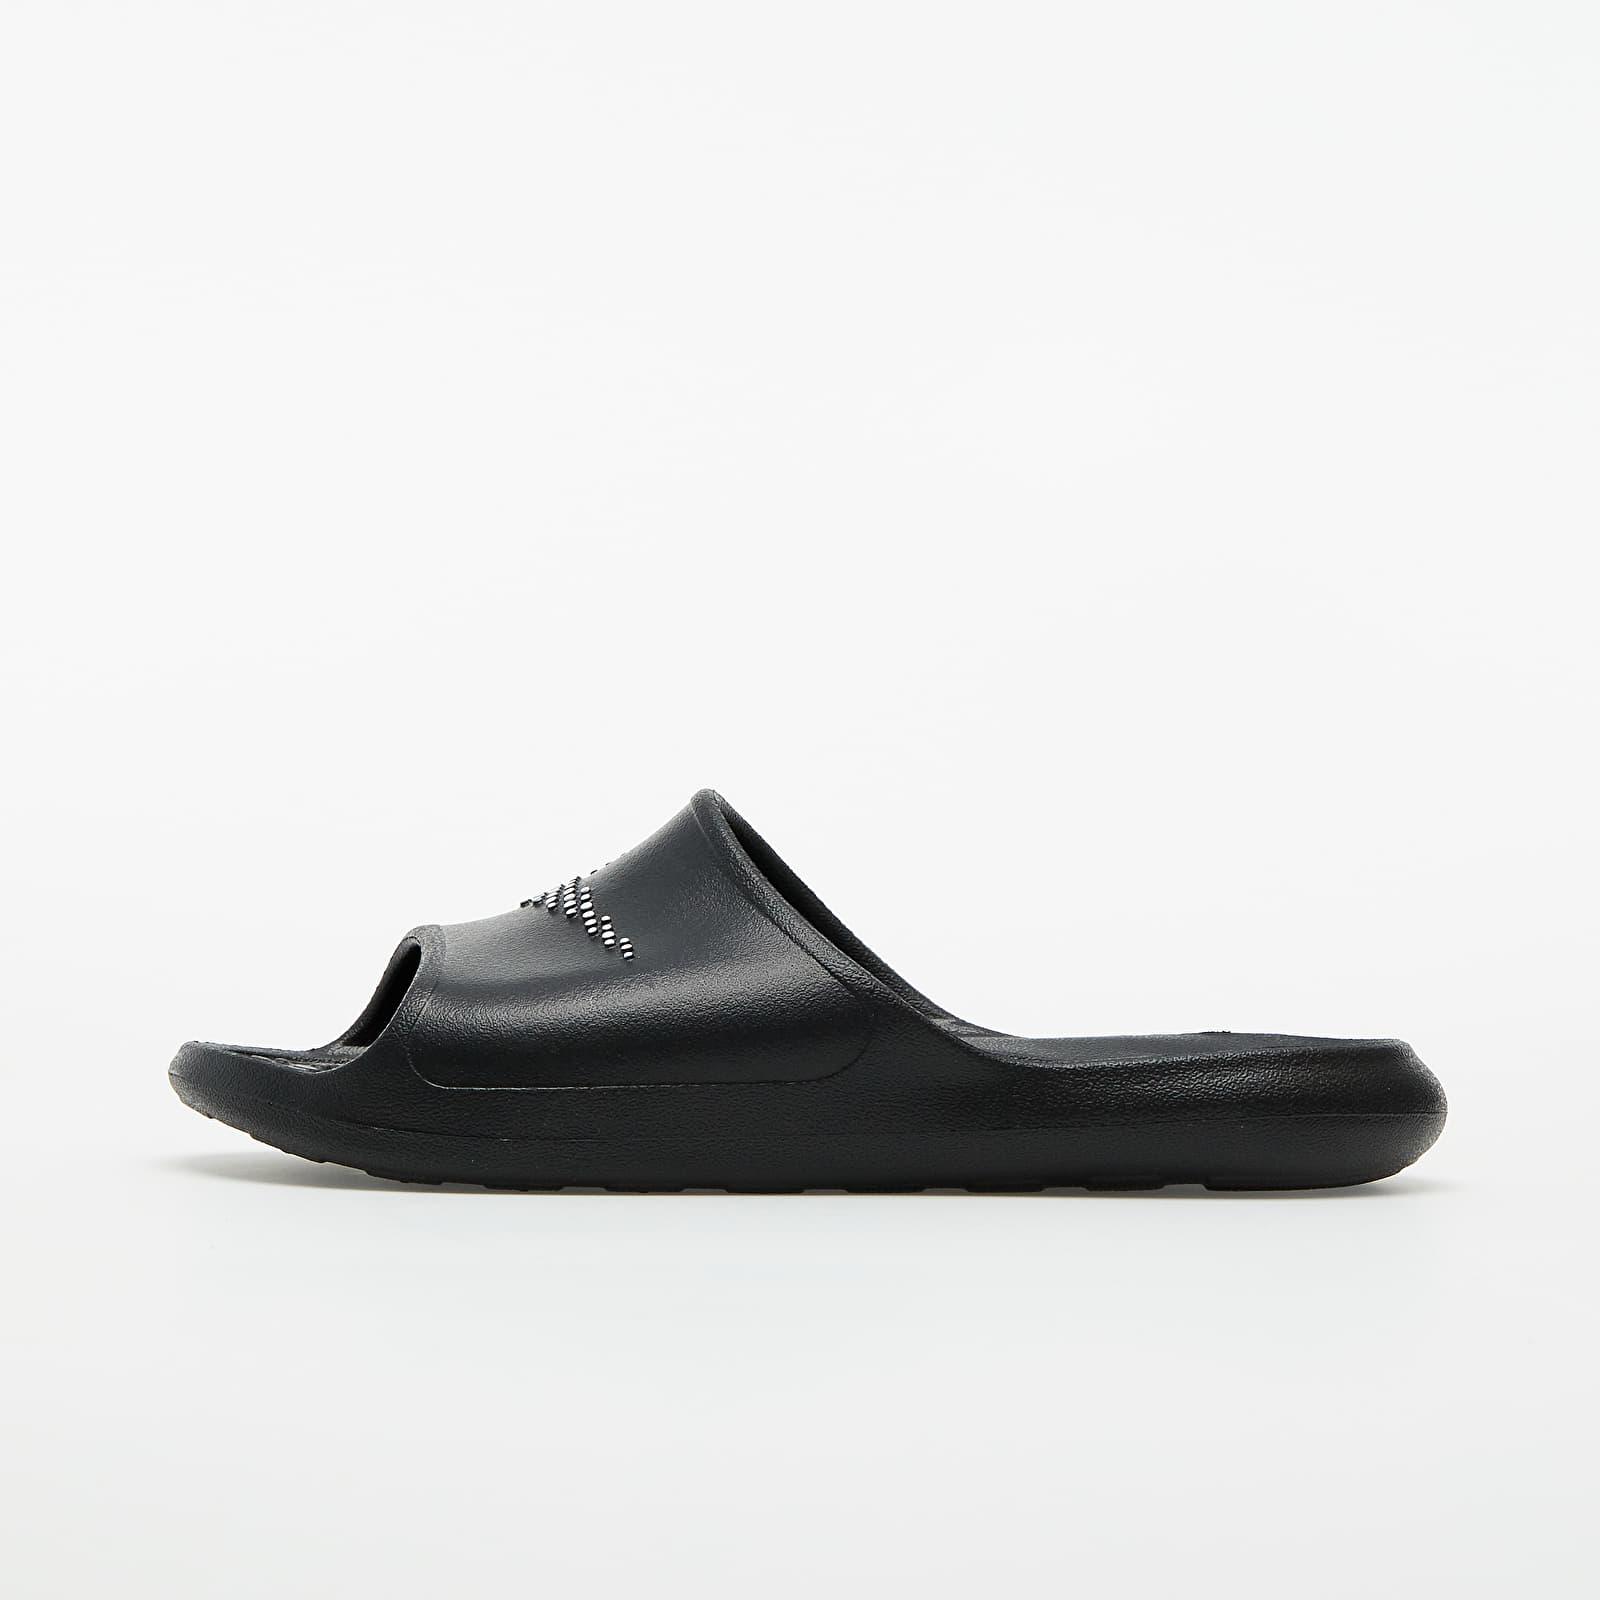 Nike Victori One Shower Slide Black/ White-Black EUR 45